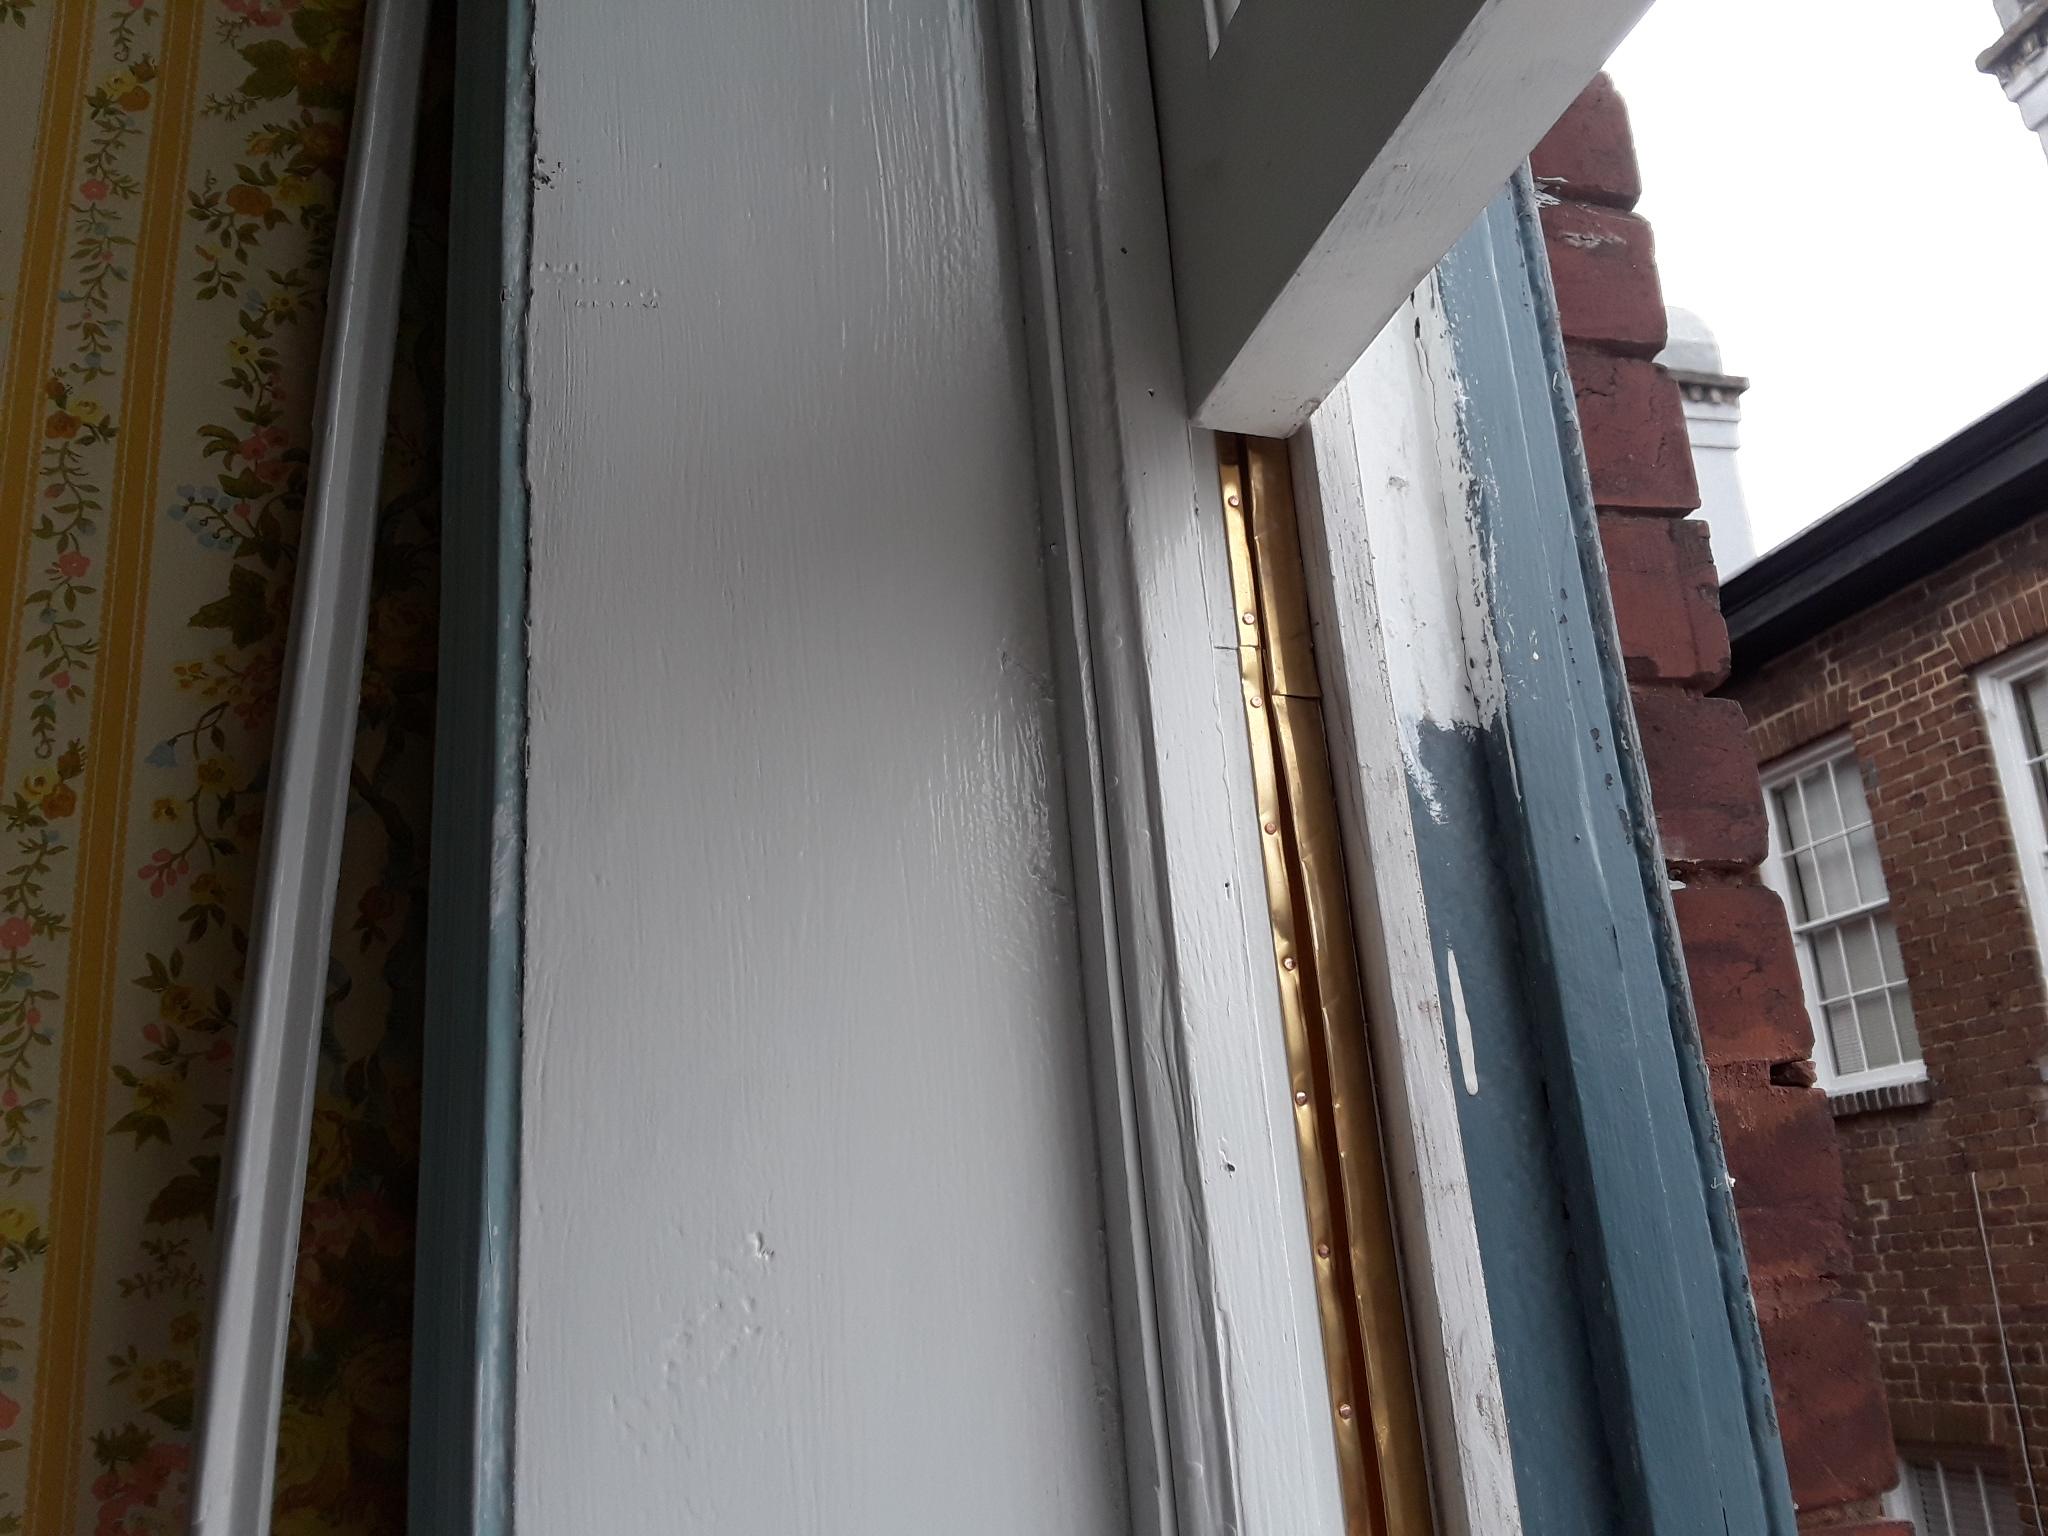 1890's window job-20181025_155550_1541650120555.jpg